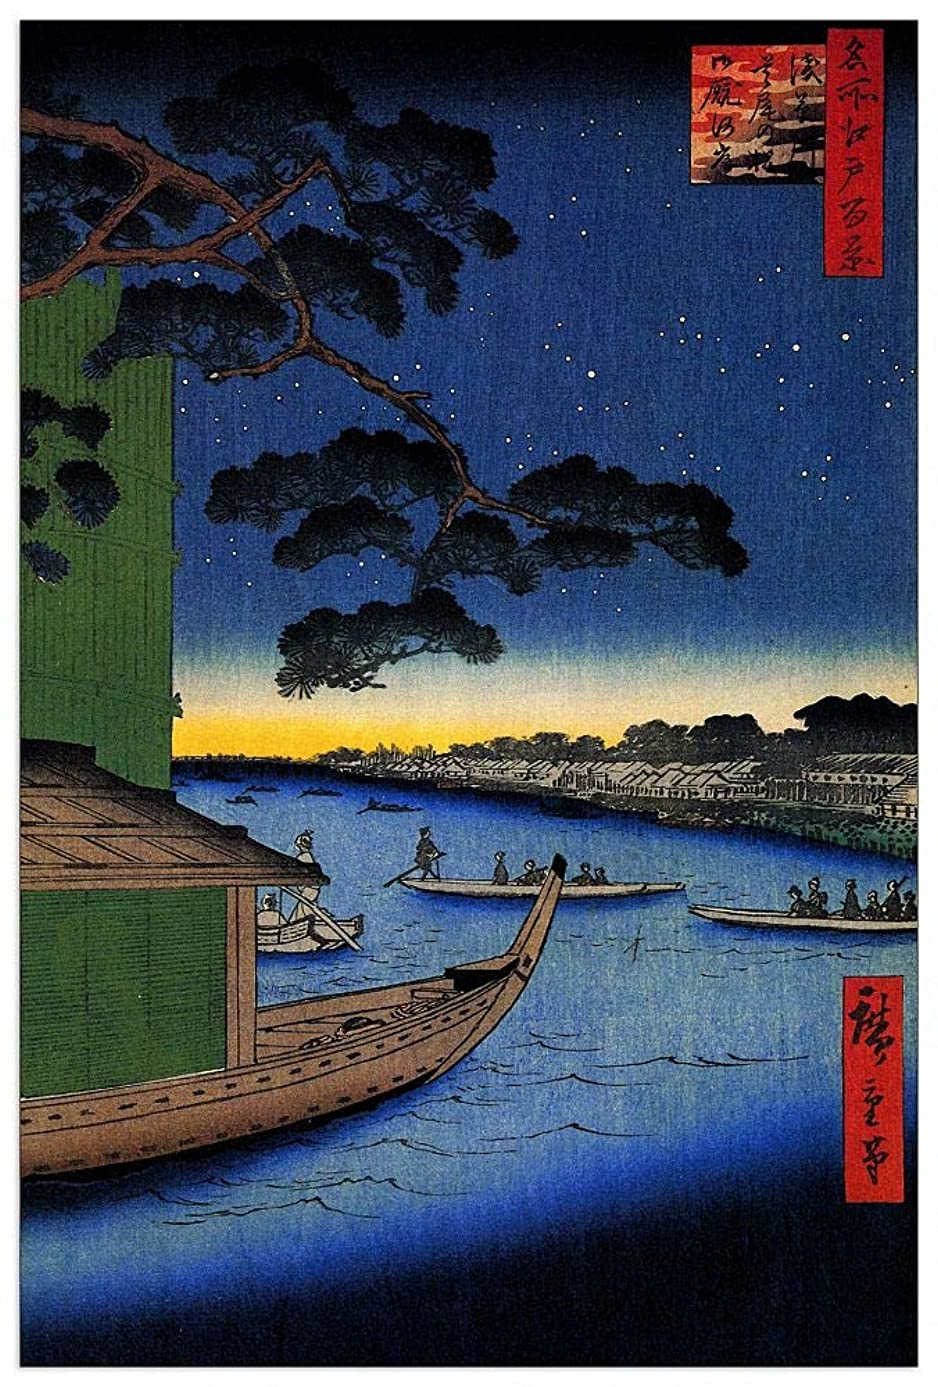 ArtPlaza TW92946 Hiroshige Utagawa - Pine of Success Decorative Panel 27.5x39.5 Inch Multicolored